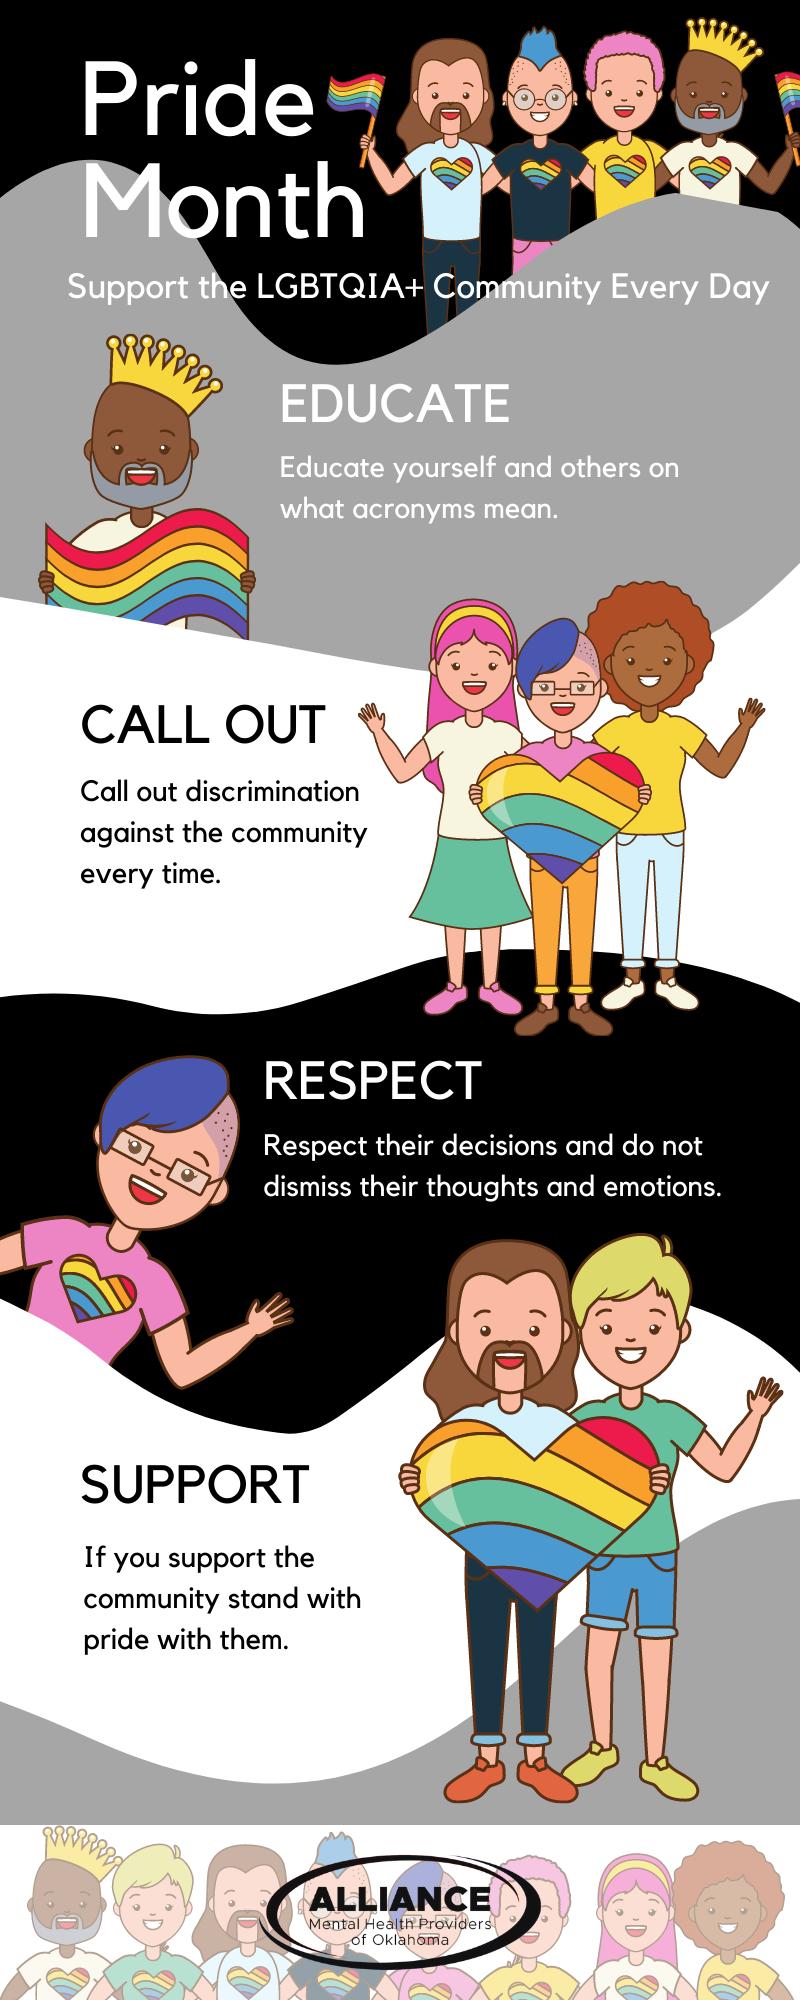 Oklahoma Pride Month